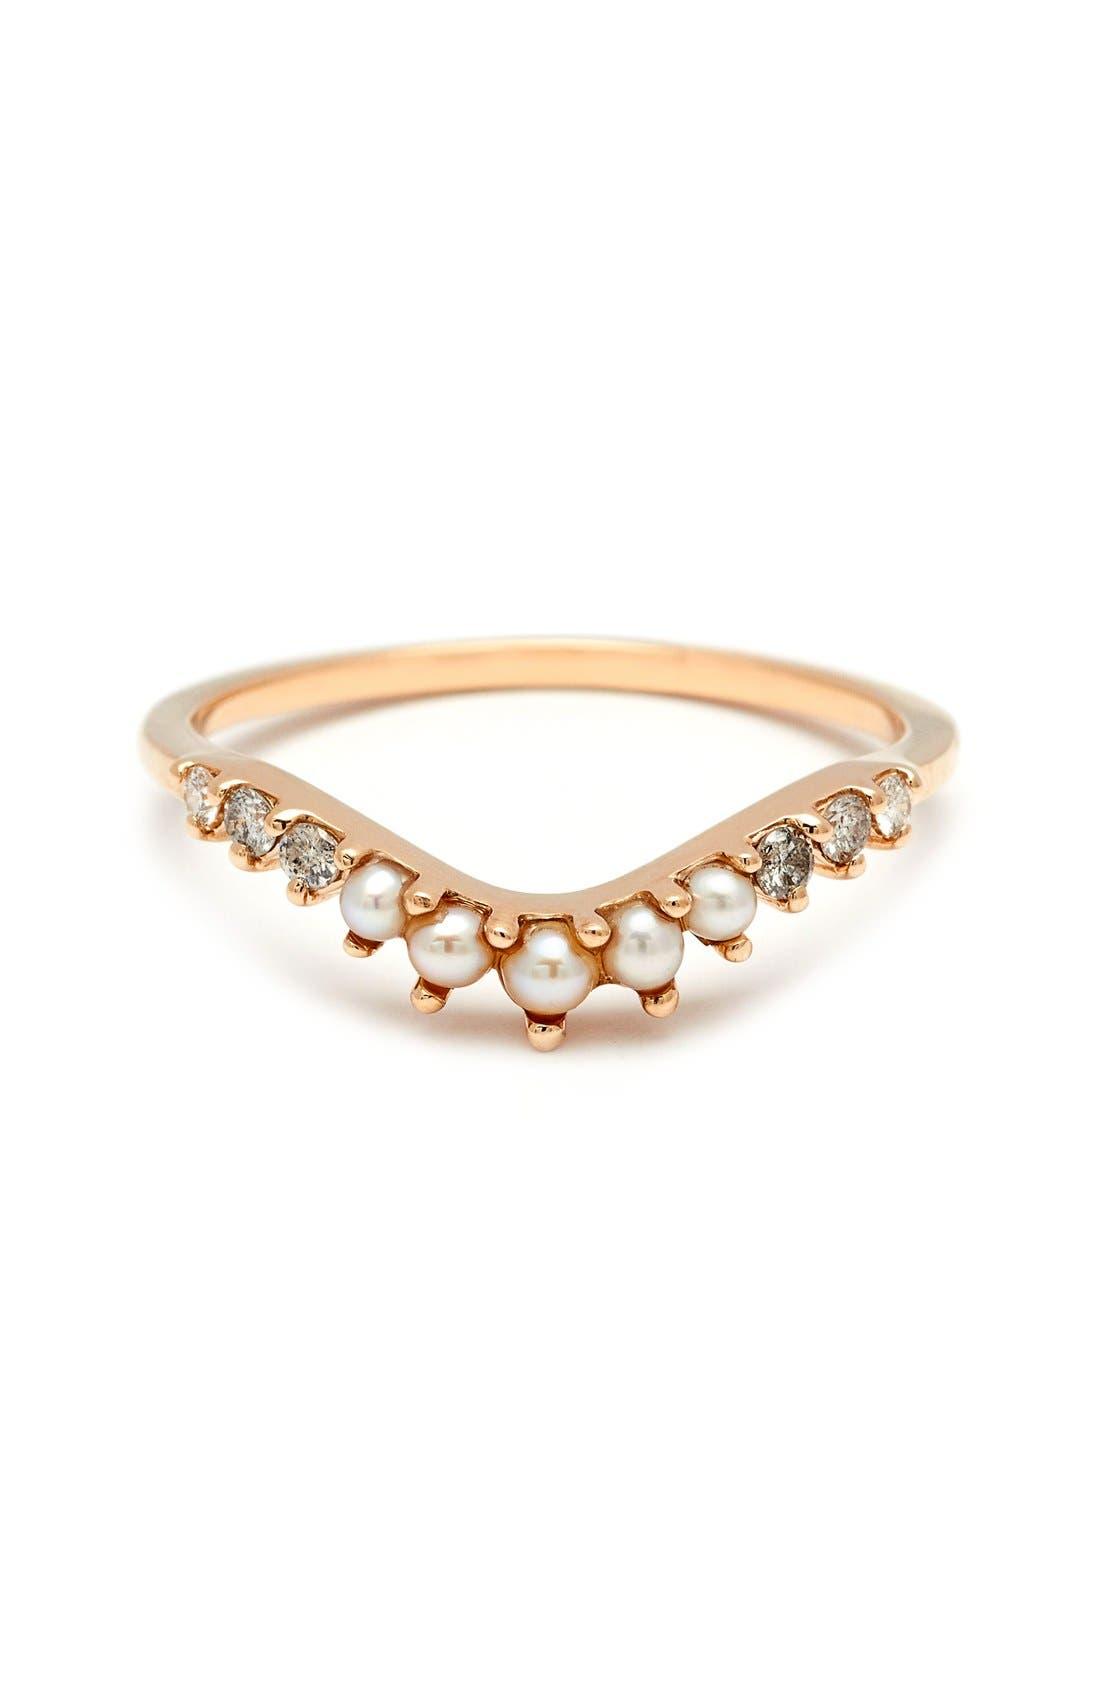 ANNA SHEFFIELD 'Tiara Curve' Diamond & Seed Pearl